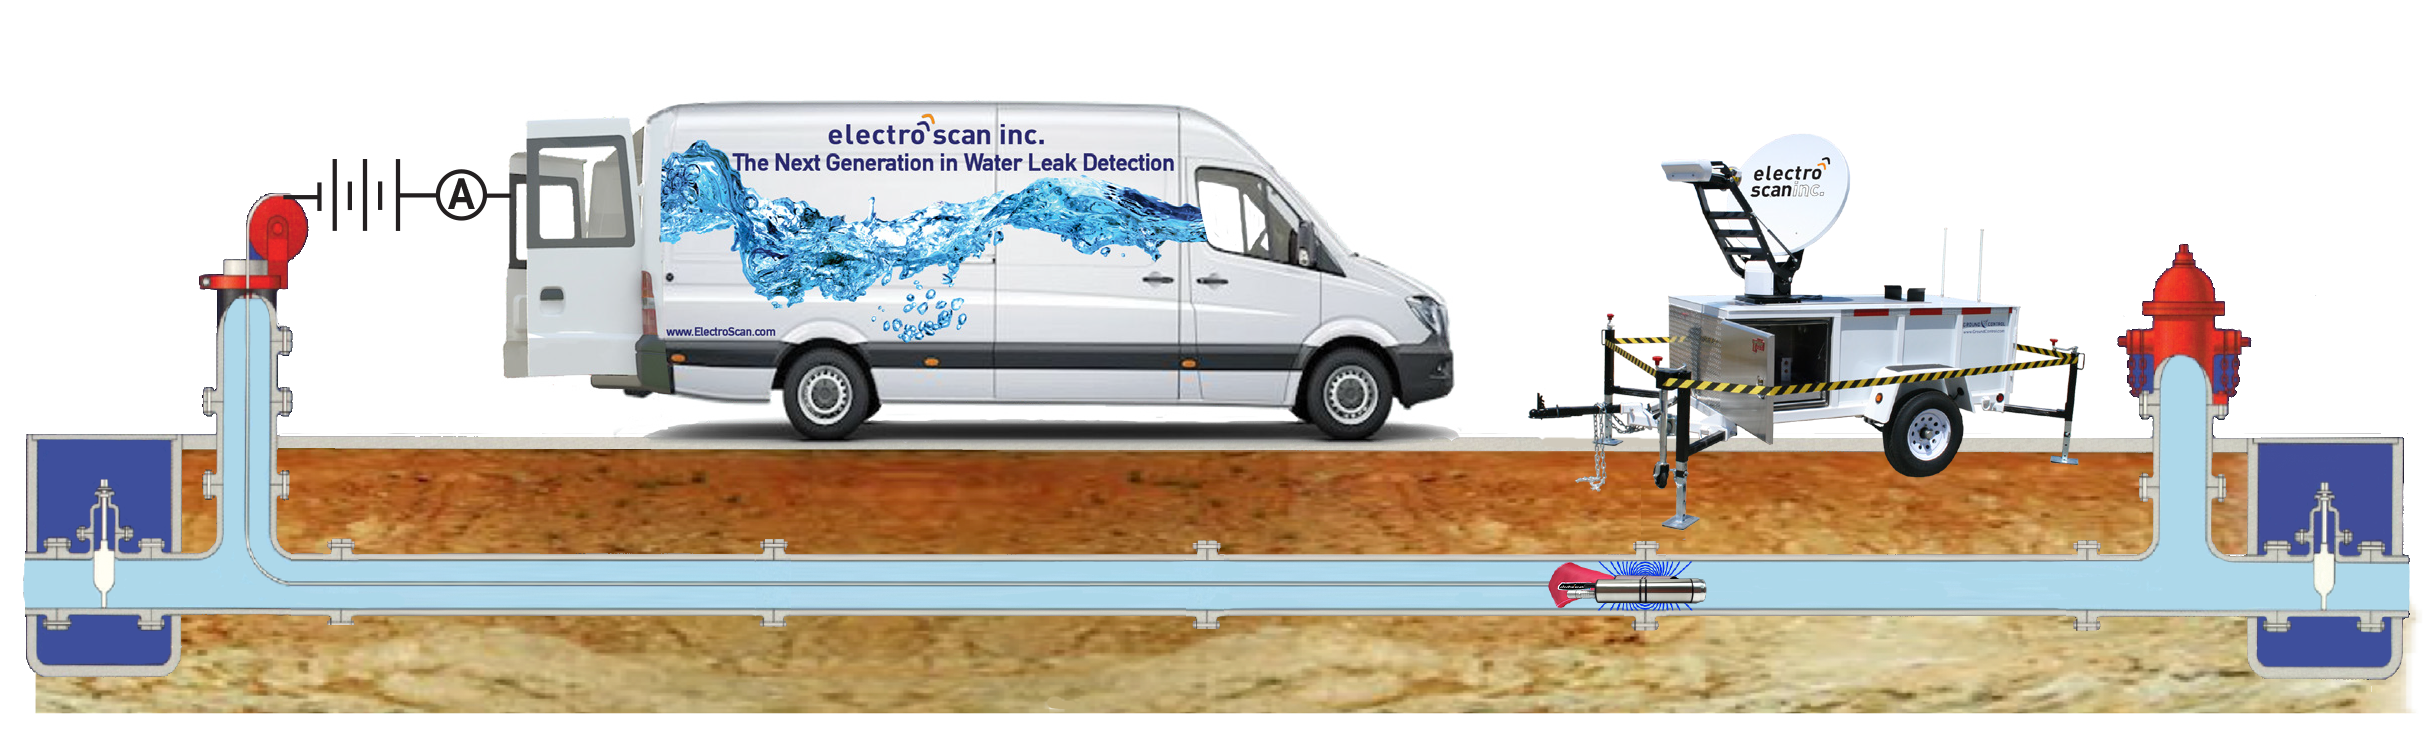 Water Leak Detection The Inside Story Engineering360